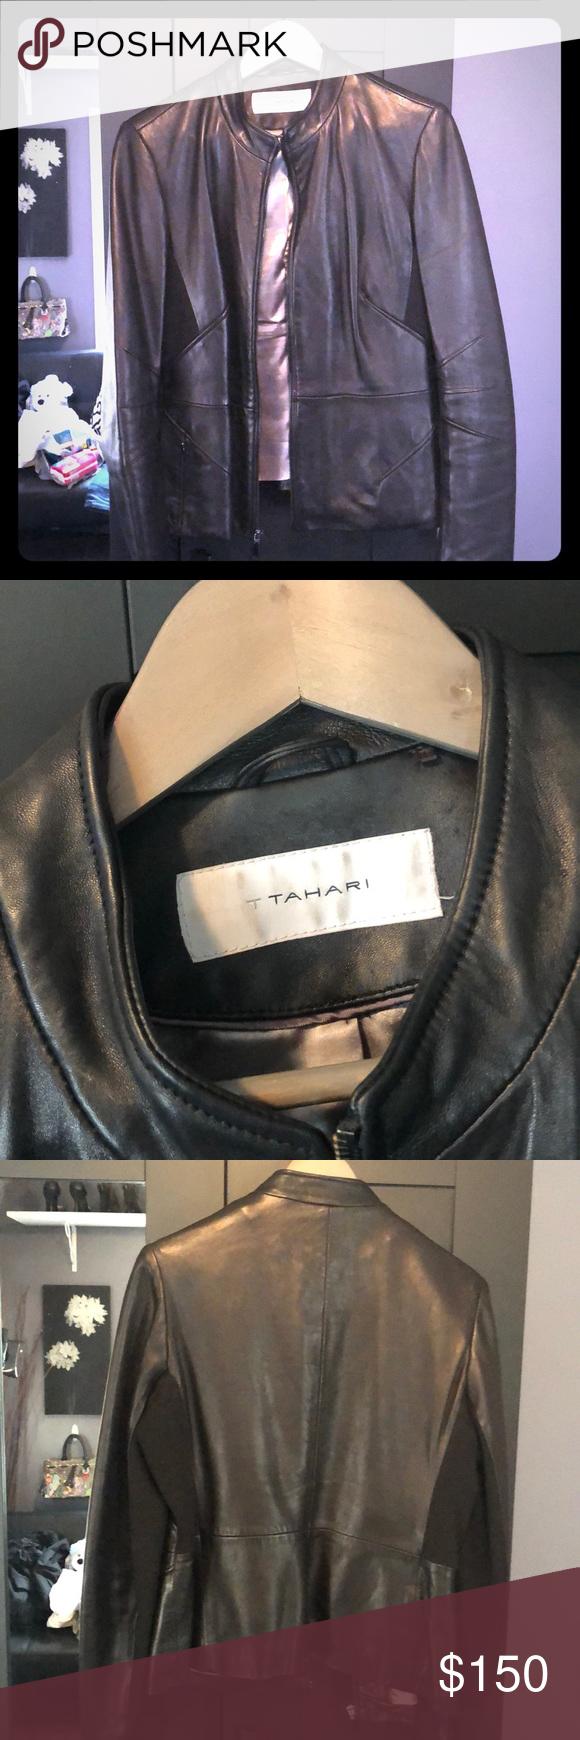 Tahari Leather Jacket Euc Black Butter Soft Leather Two Zipper Pockets Tahari Jackets Coats Leather Jacket Jackets Clothes Design [ 1740 x 580 Pixel ]